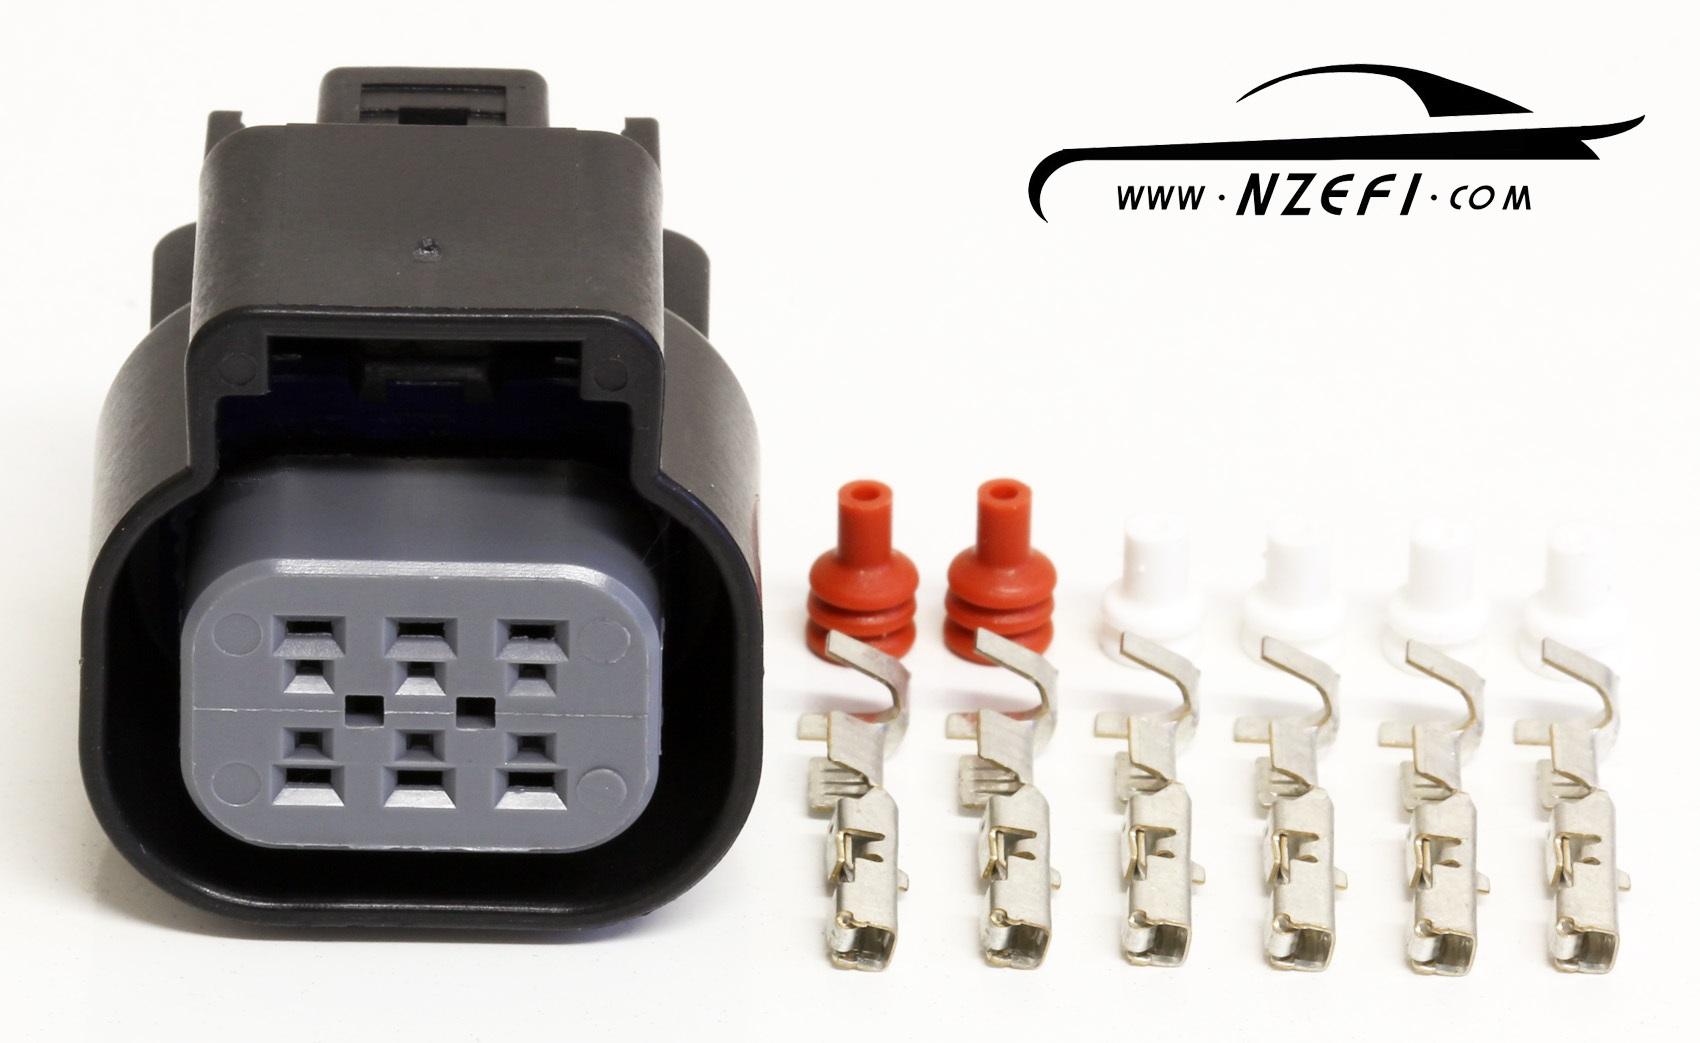 hight resolution of ls7 wiring harness ecu pin diagram data schema ls7 wiring harness ecu pin